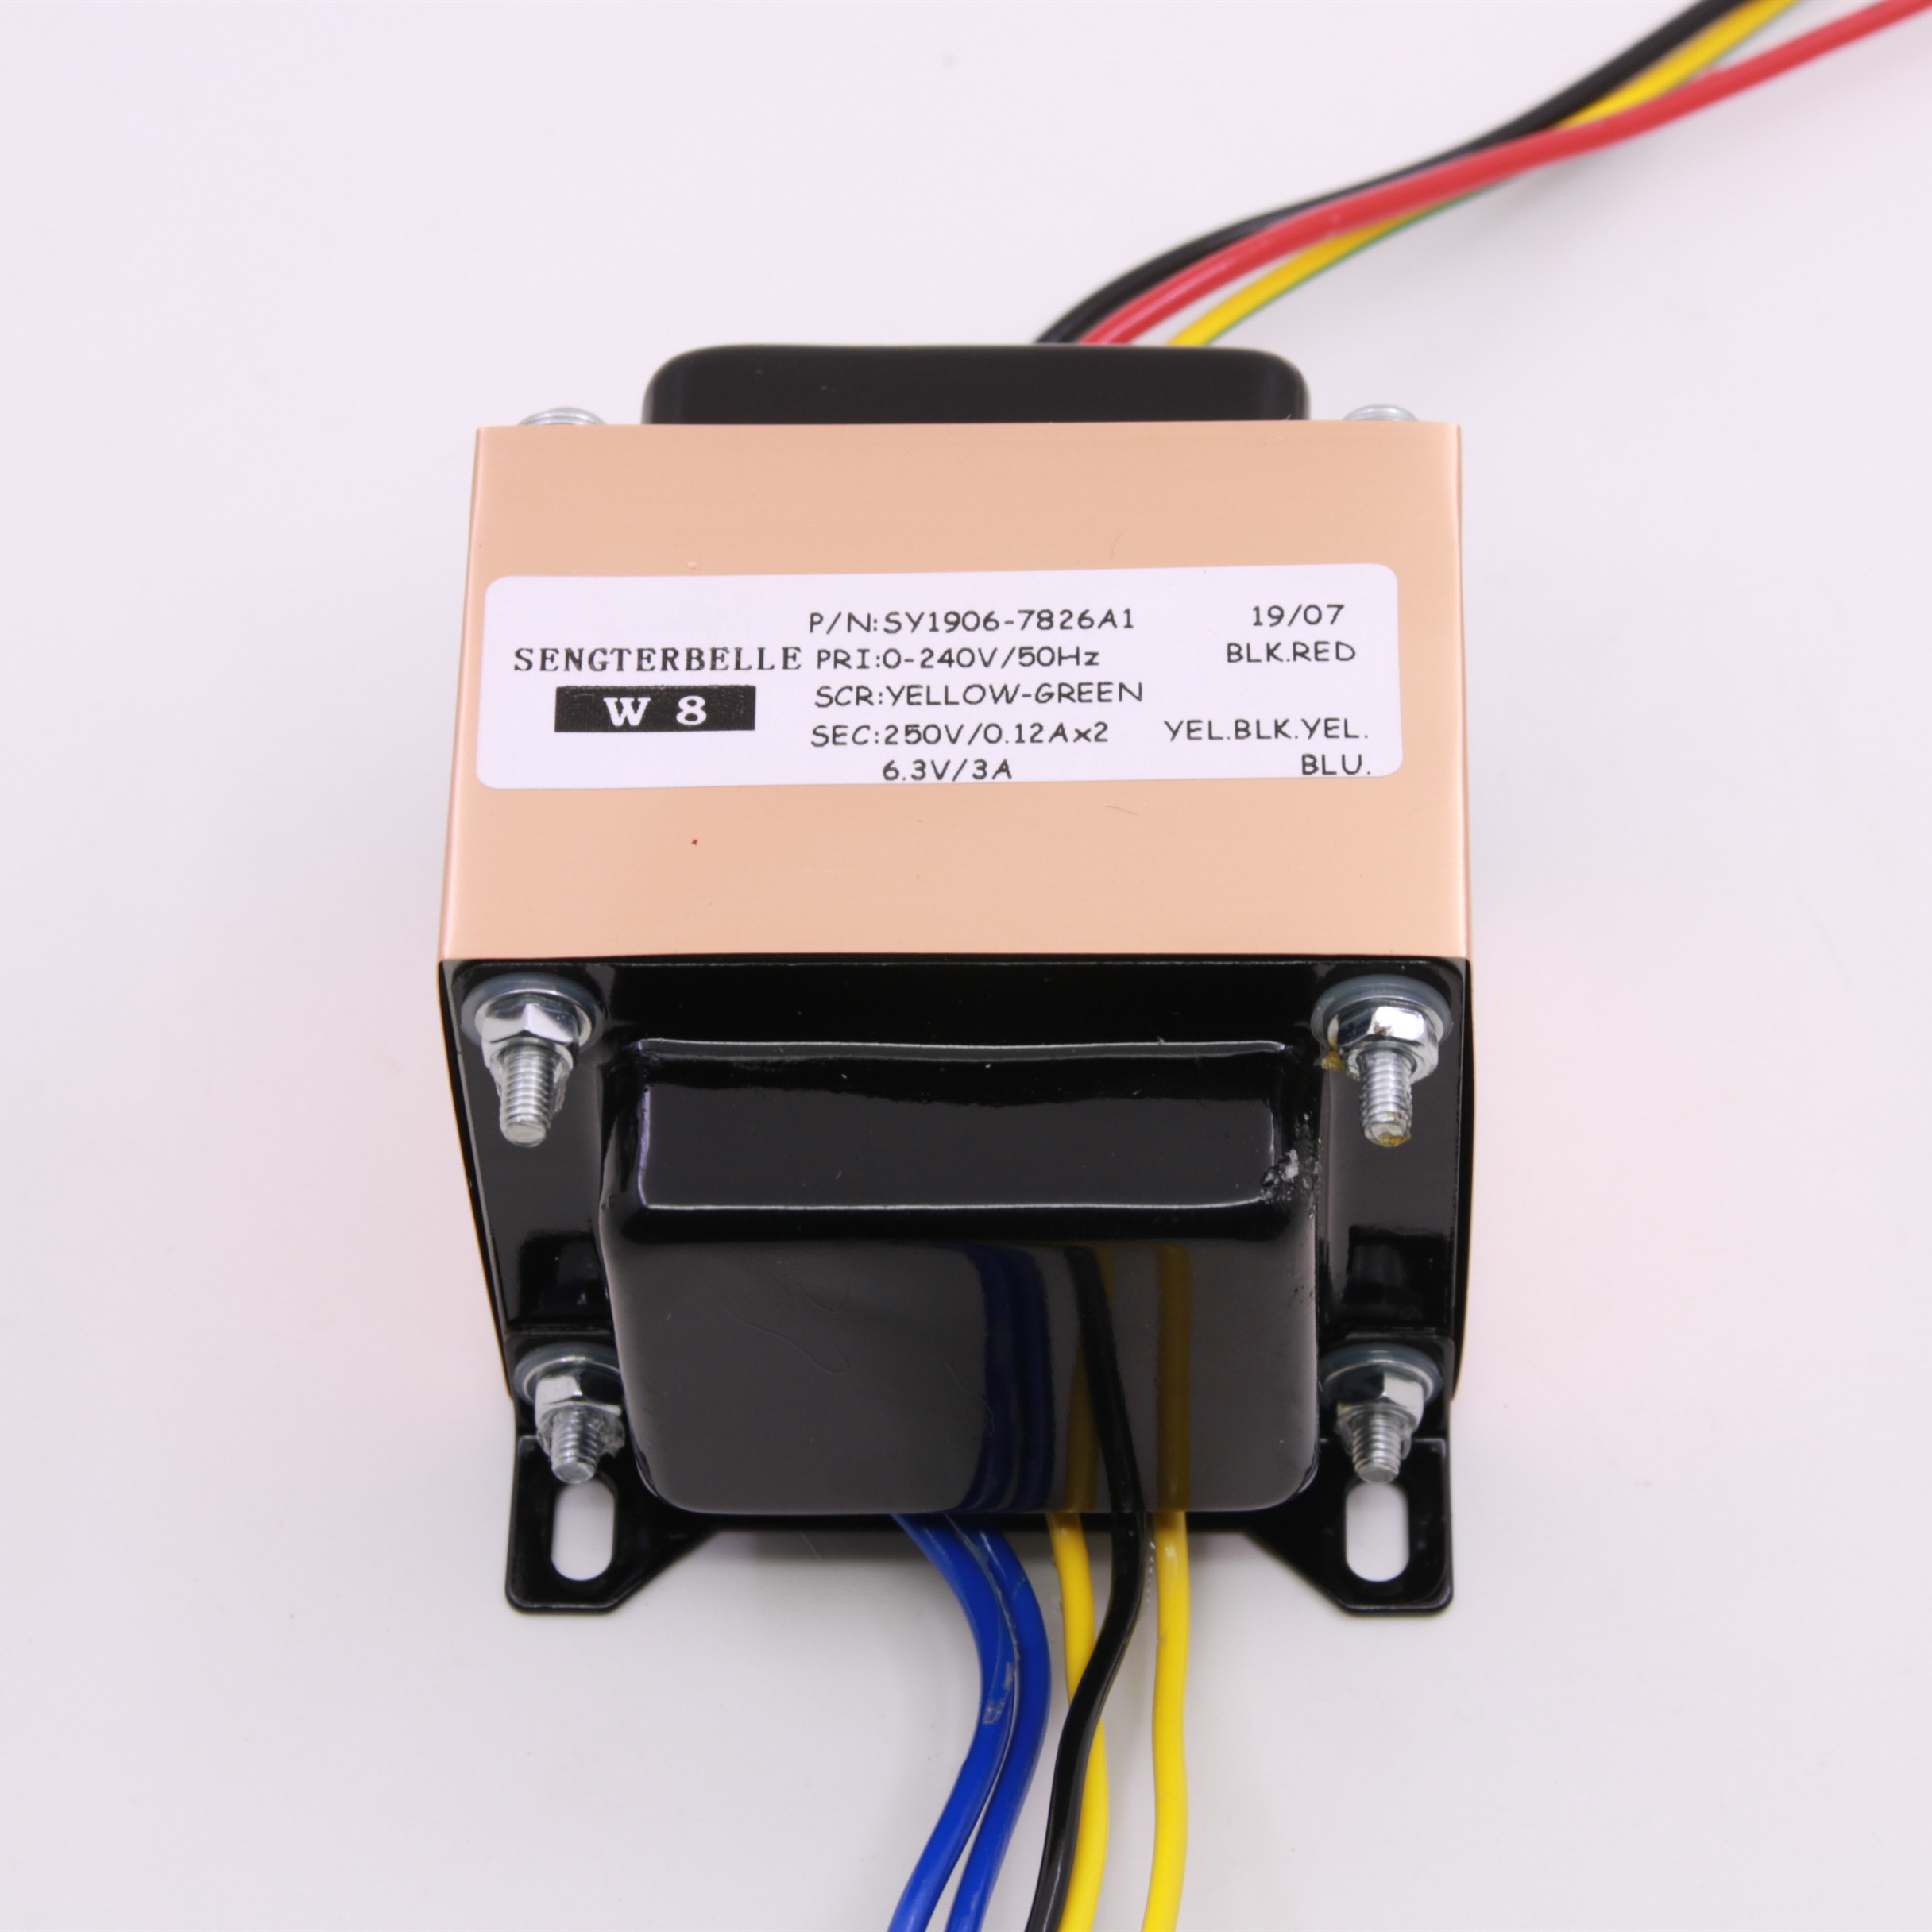 HIFI Amplifier Audio EI Transformer Output: AC250V (120mA)-0-AC250V (120mA), 0-AC6.3V (3A) Tube Amp PowerSupply